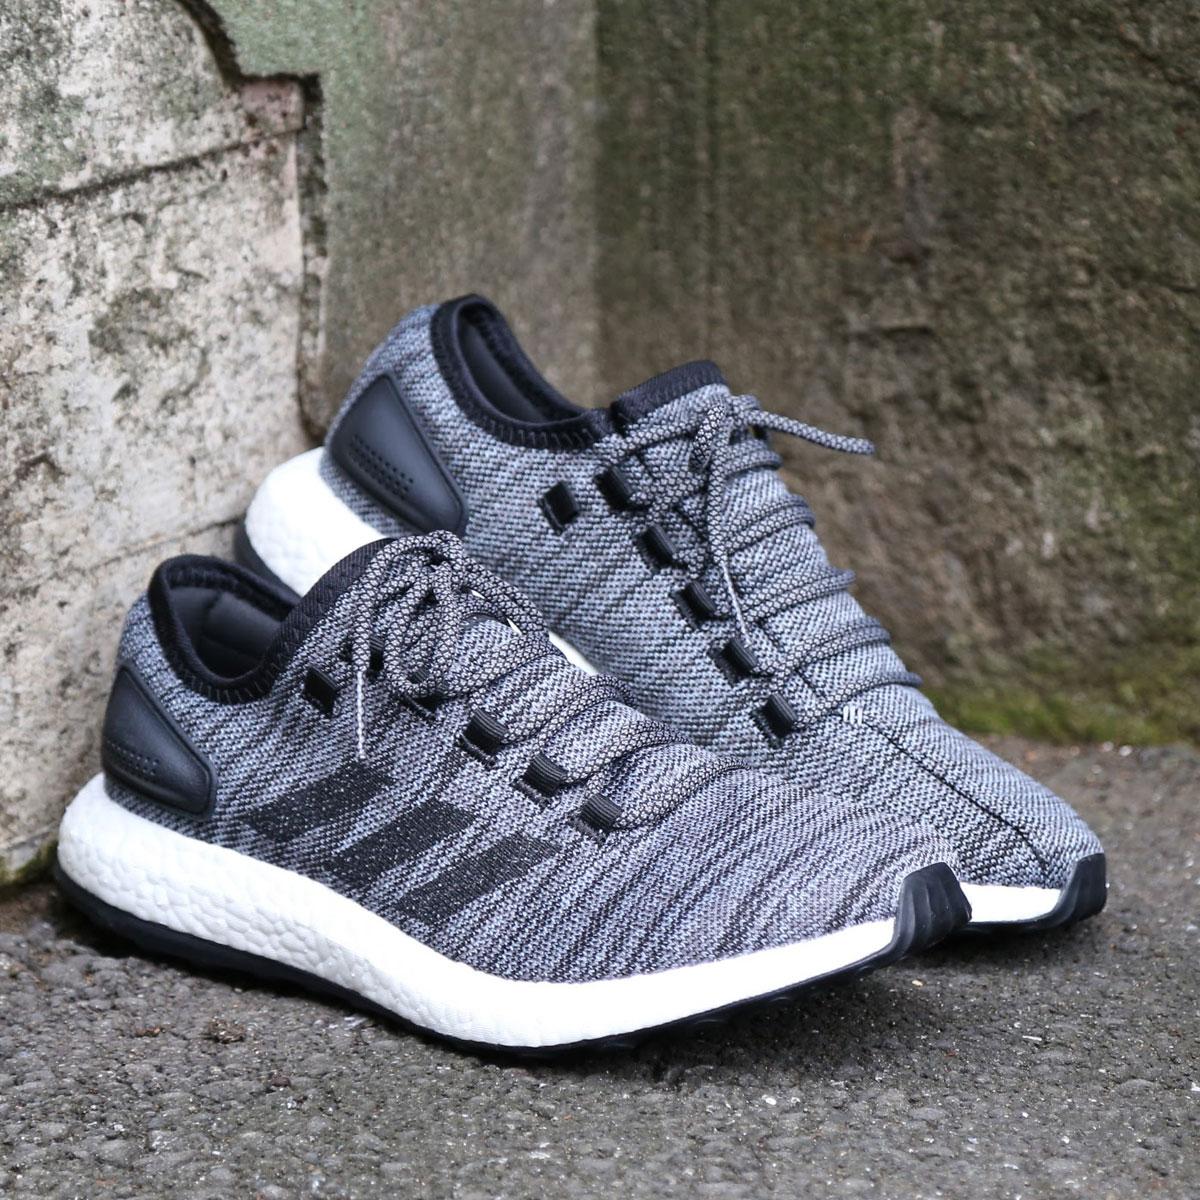 adidas Originals Pure BOOST ATR (アディダス オリジナルス ピュアブースト ATR) Core Black/Core Black/Grey Three【メンズ スニーカー】17FW-S